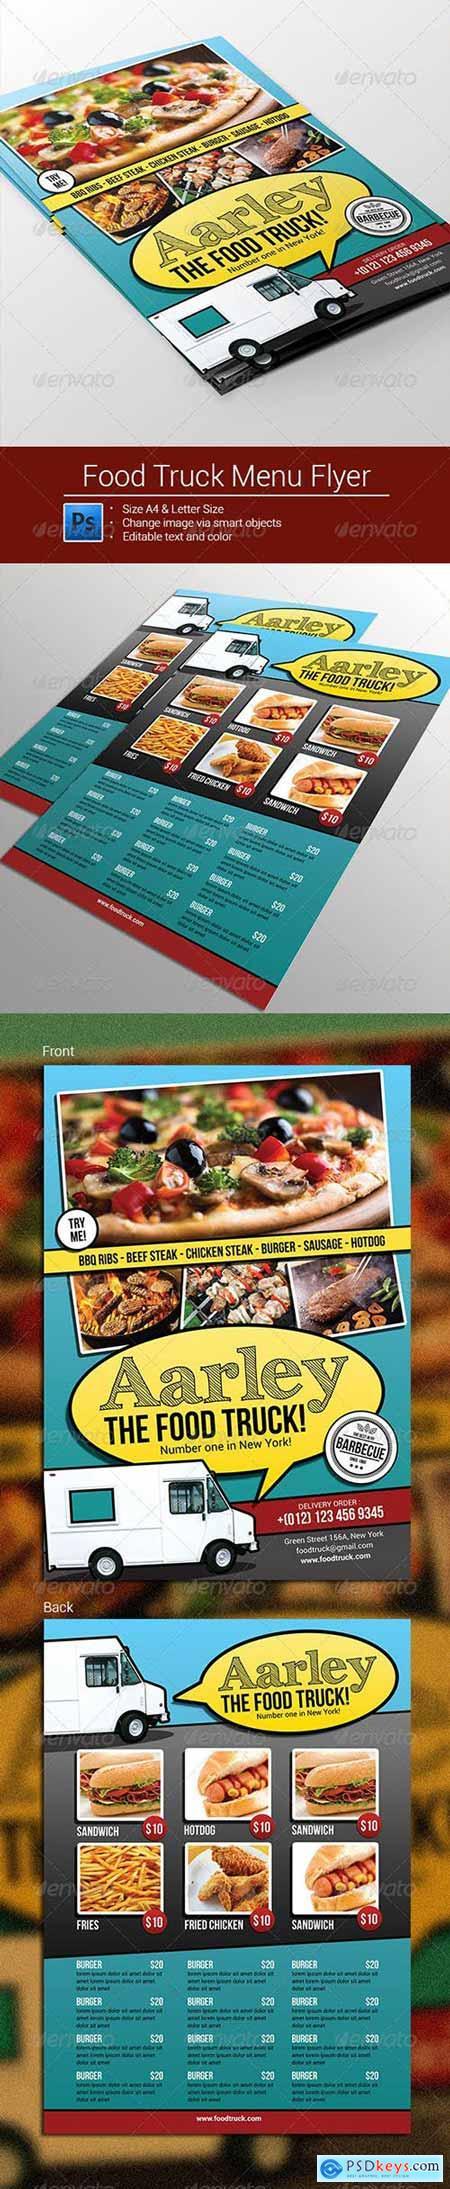 Food Truck Menu Flyer 8399366